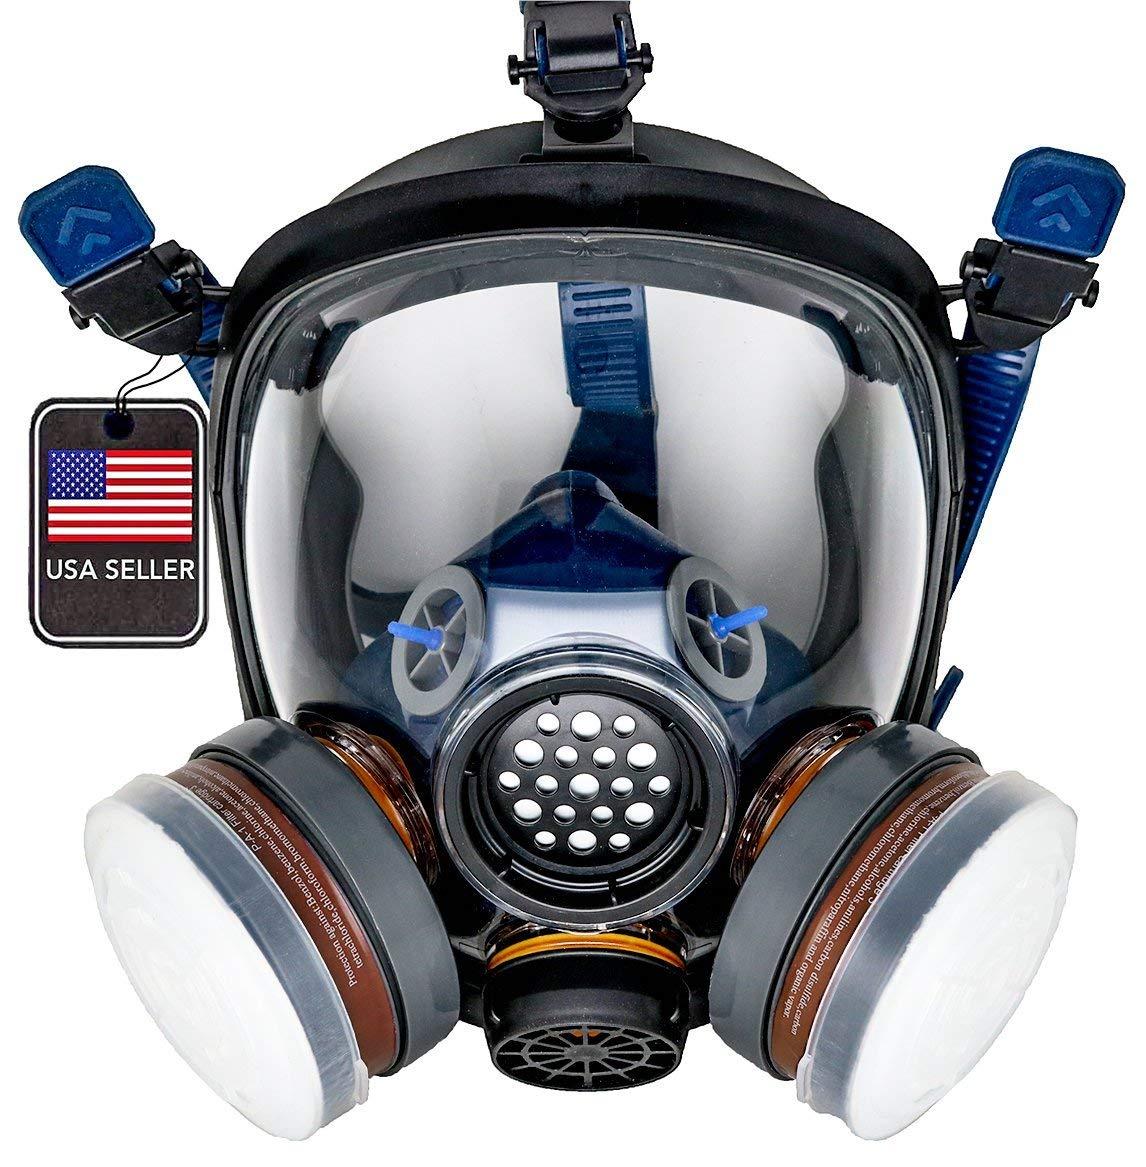 PD-100 Full Face Respirator